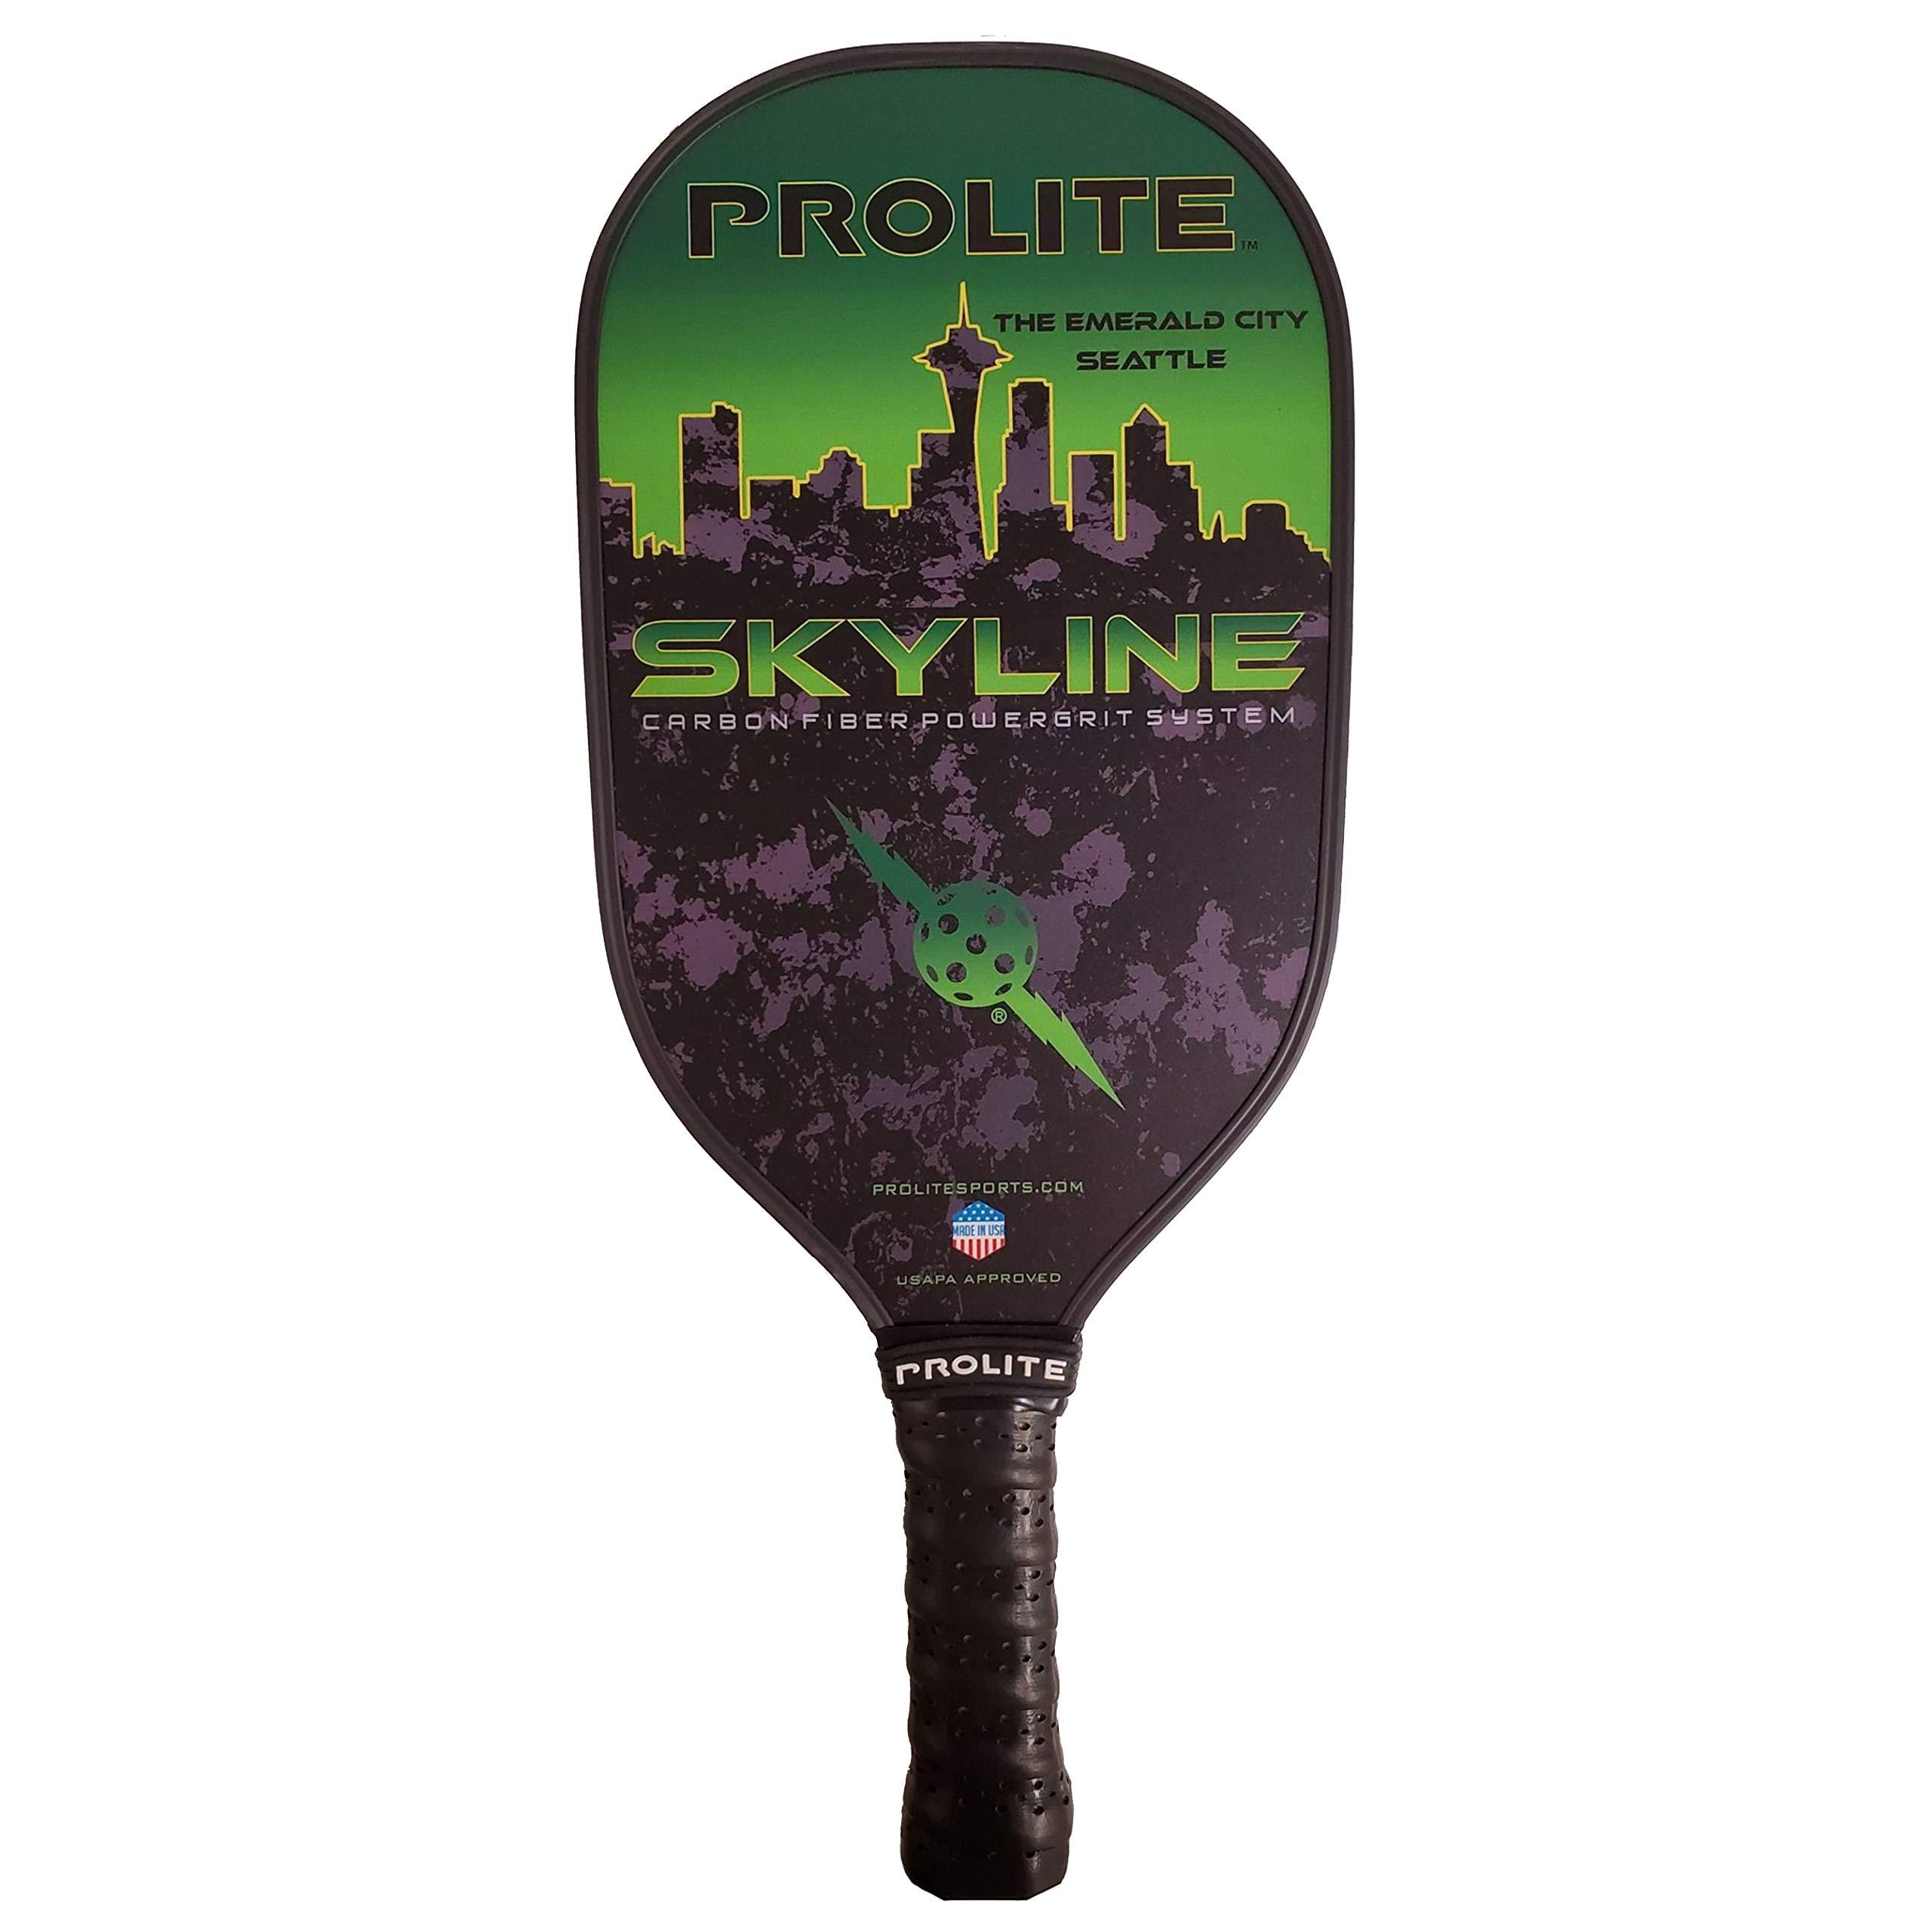 PROLITE Skyline Pickleball Paddle - Seattle